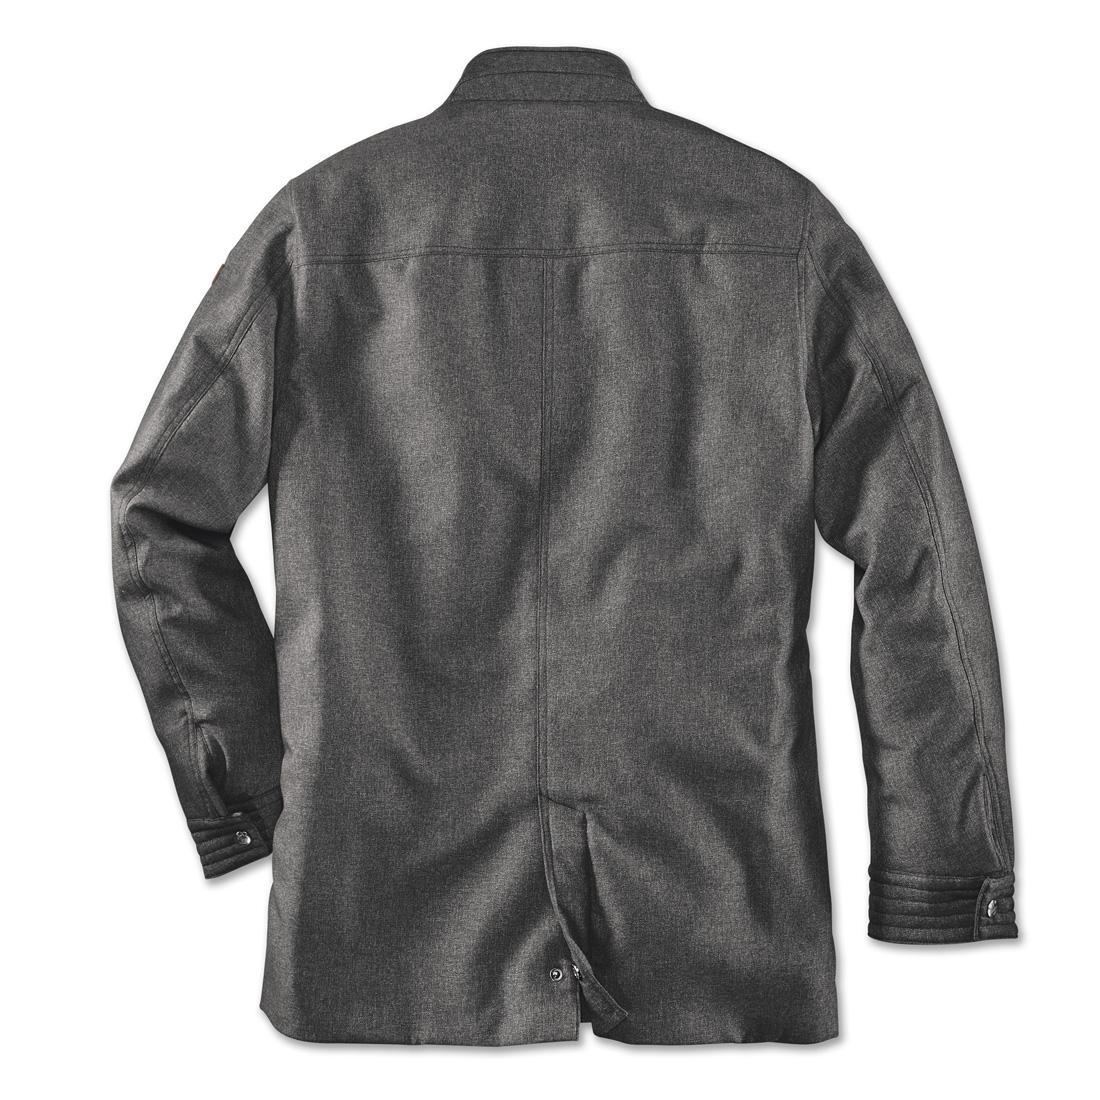 BMW Jacket Men's Grey